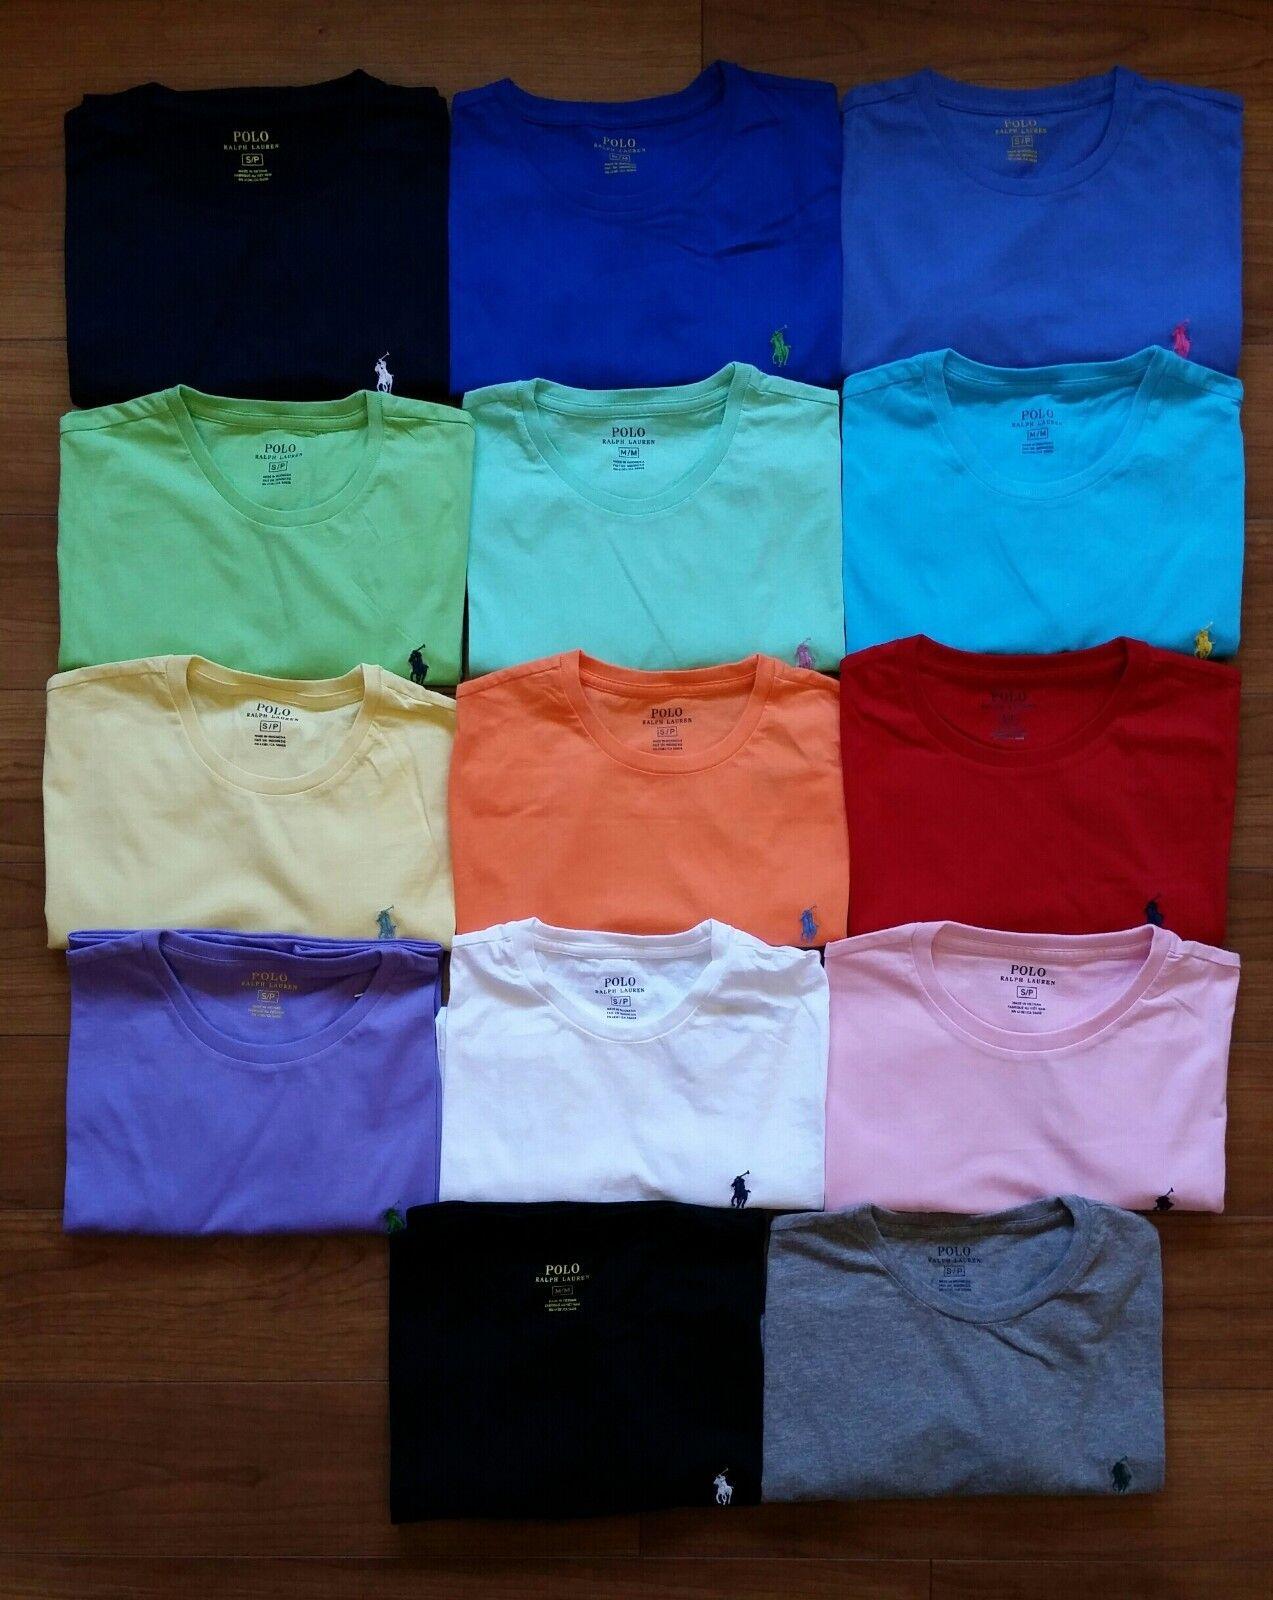 NEW Men Polo Ralph Lauren Crew Neck T Shirt Size S M L XL XXL - STANDARD FIT.